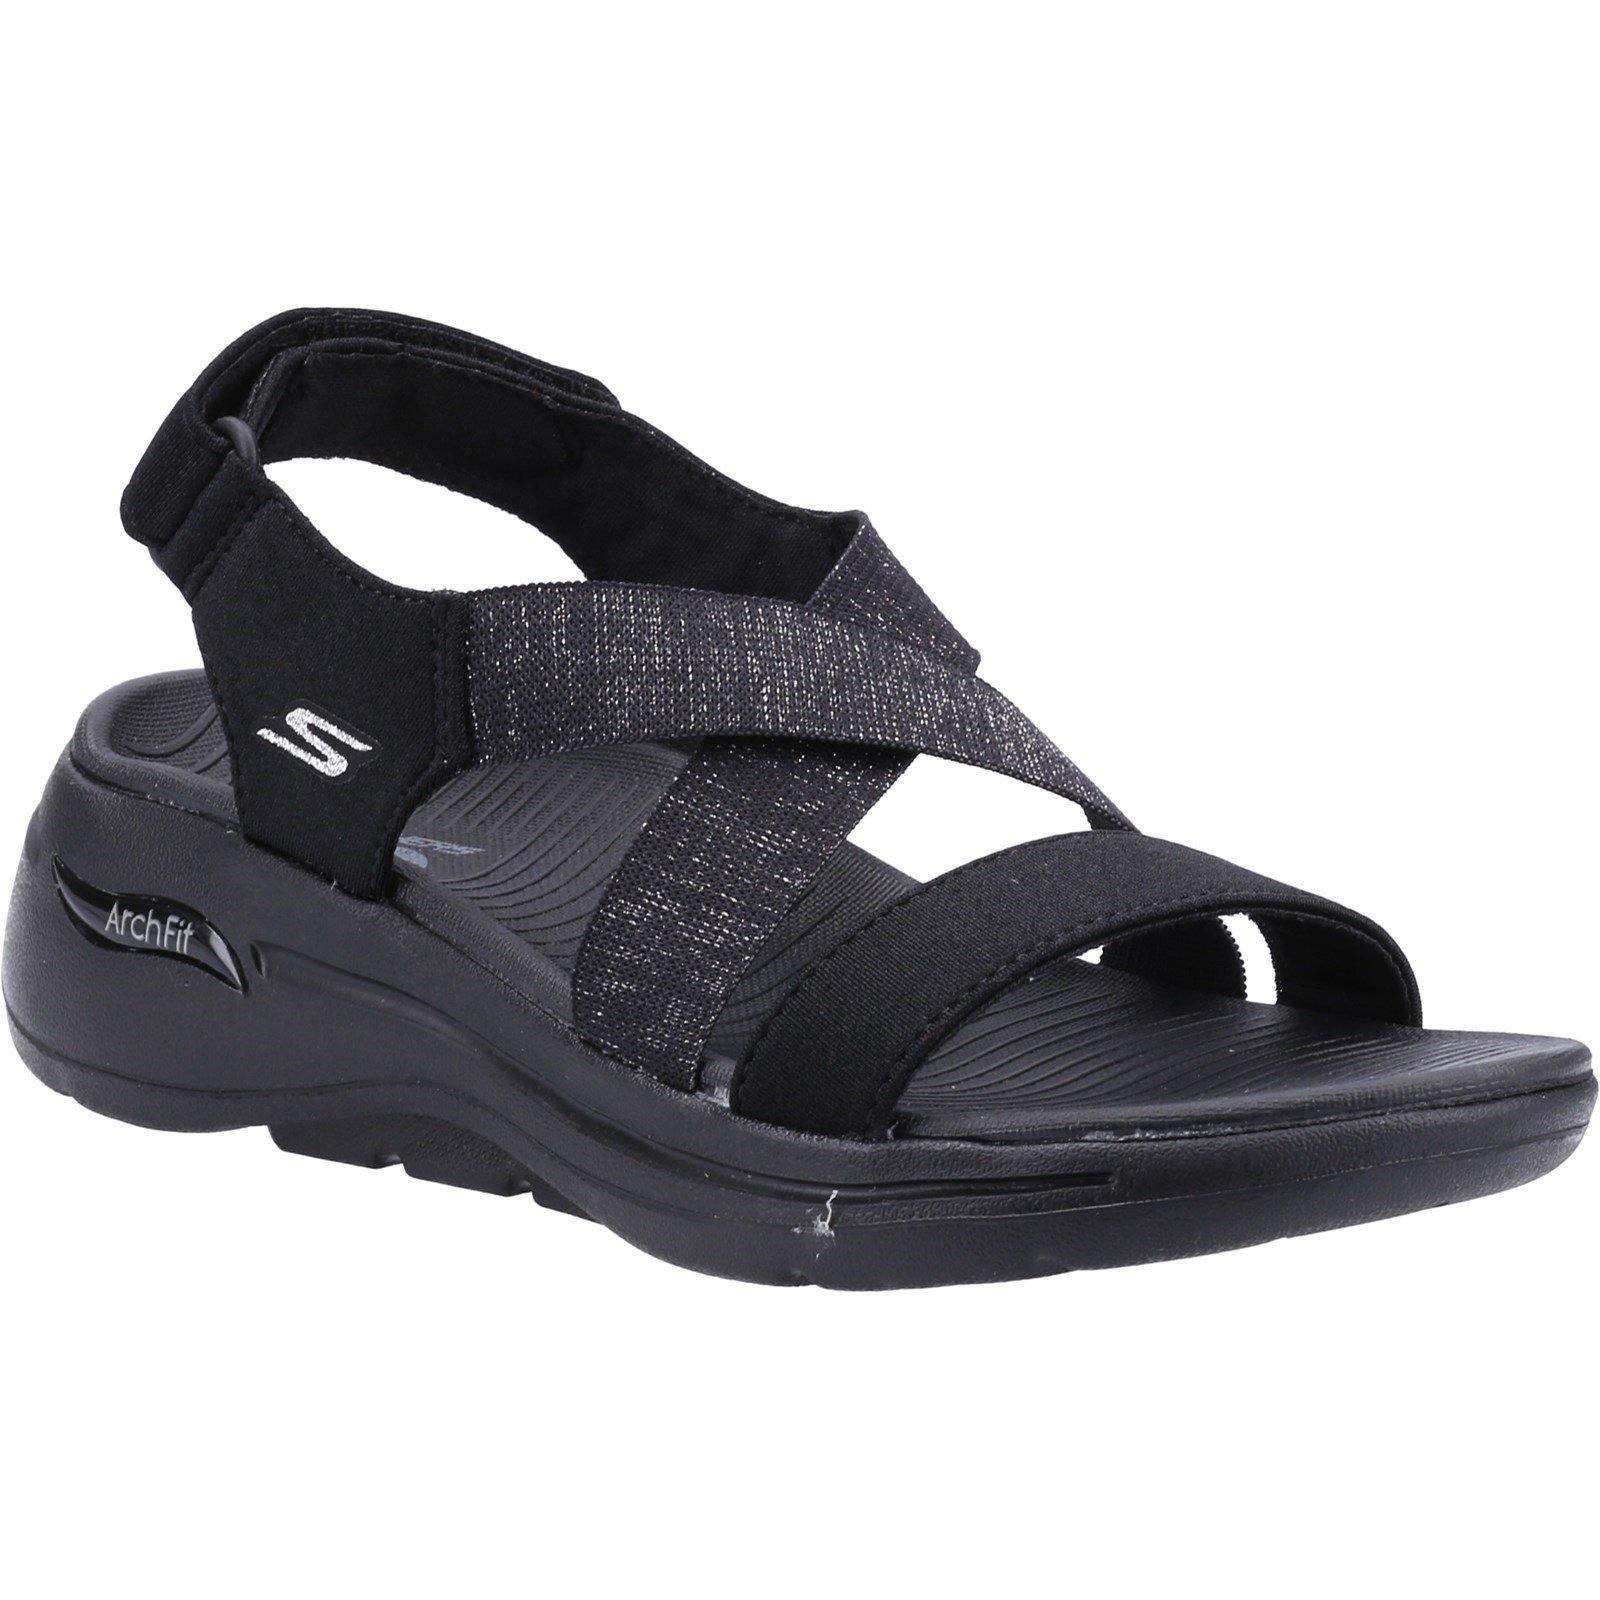 Skechers Women's Go Walk Arch Fit Astonish Summer Sandal Various Colours 32153 - Black 8